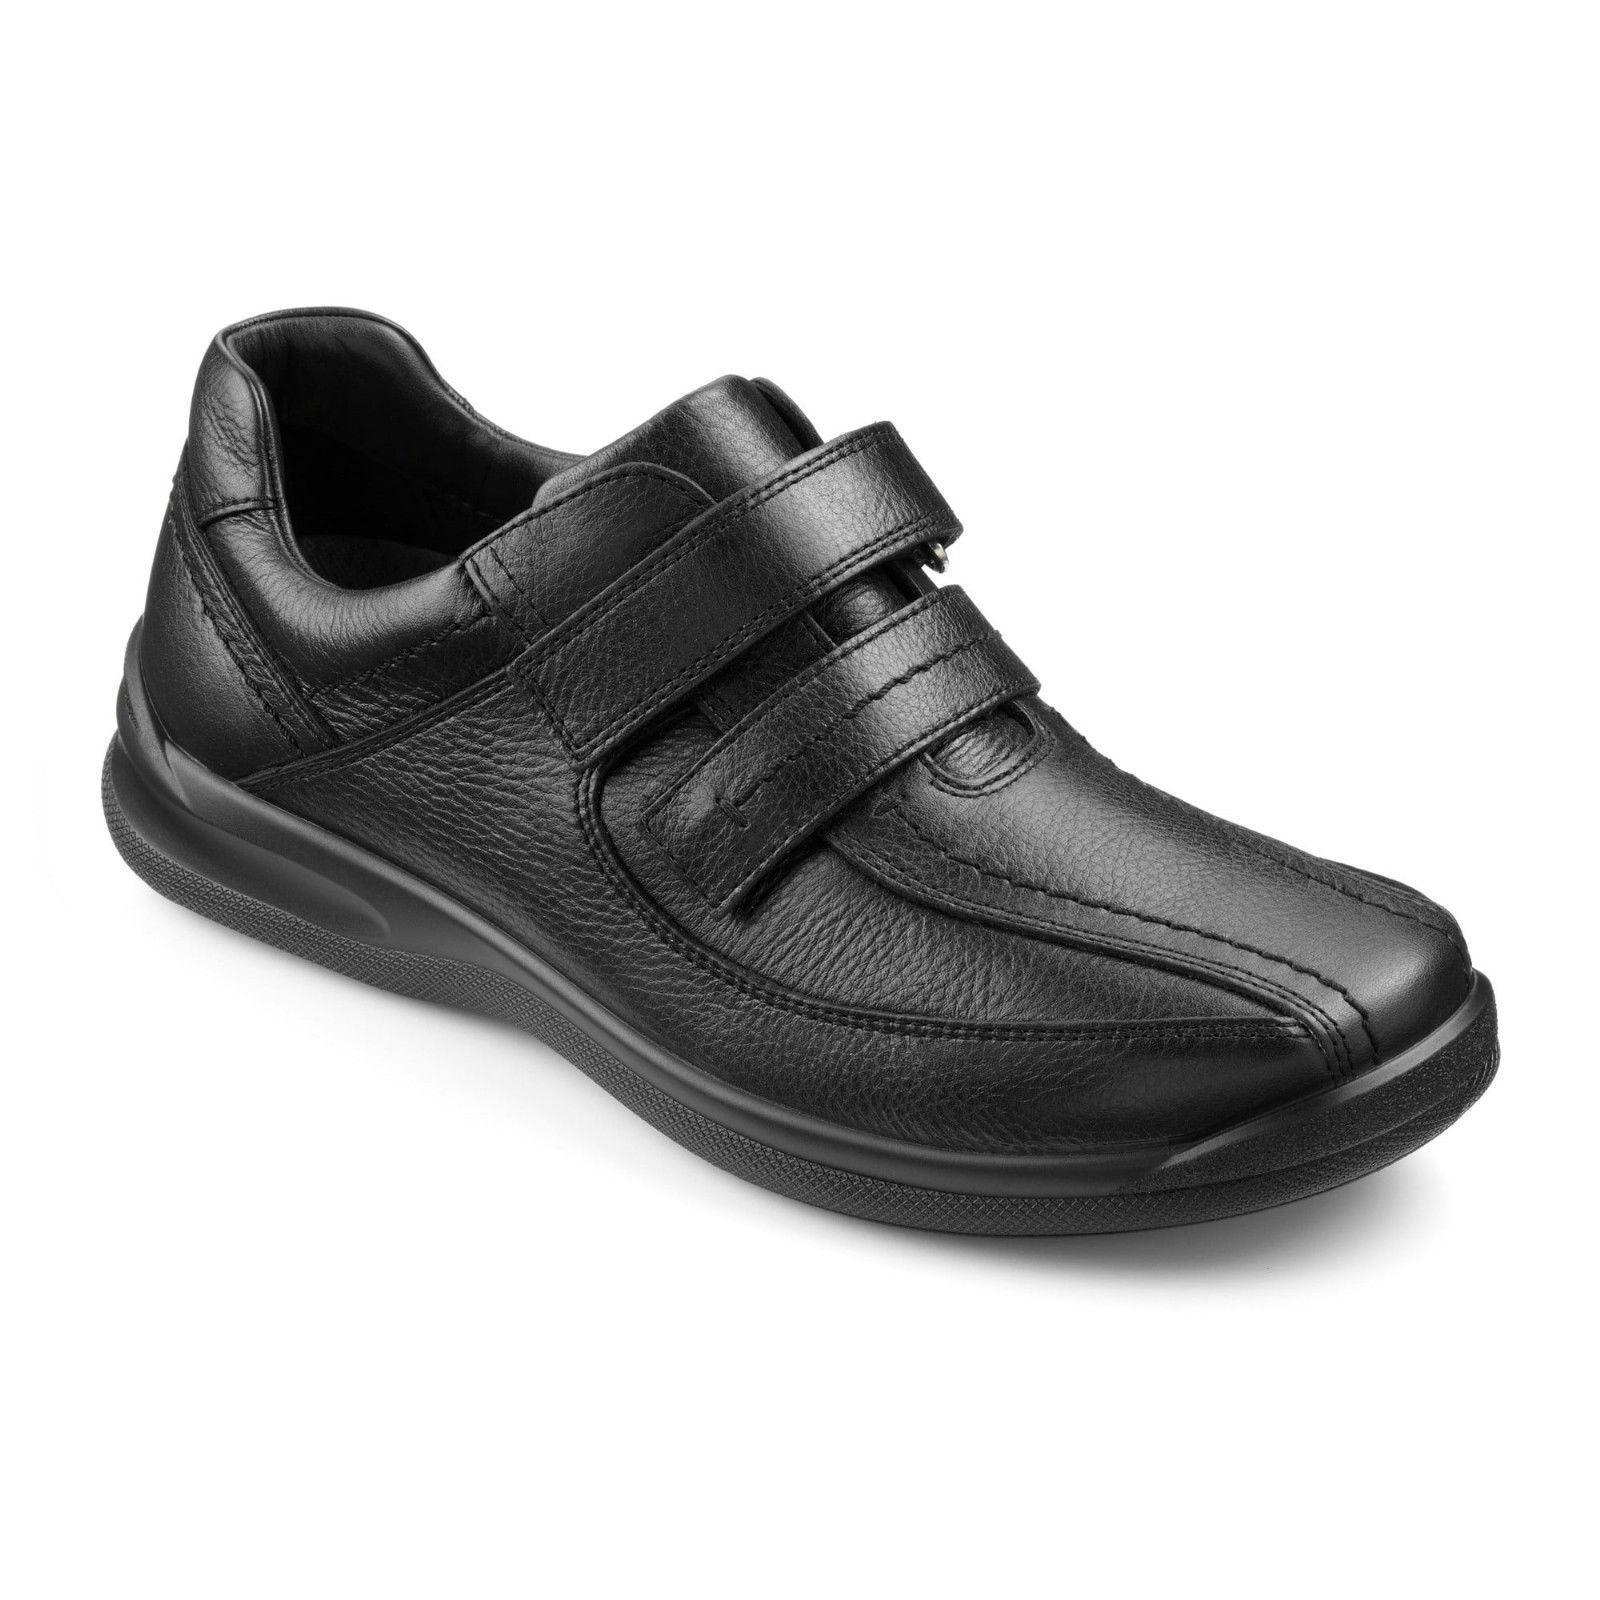 Hotter Mens Medway Black Wide Fitting Comfort Shoes rrp £79